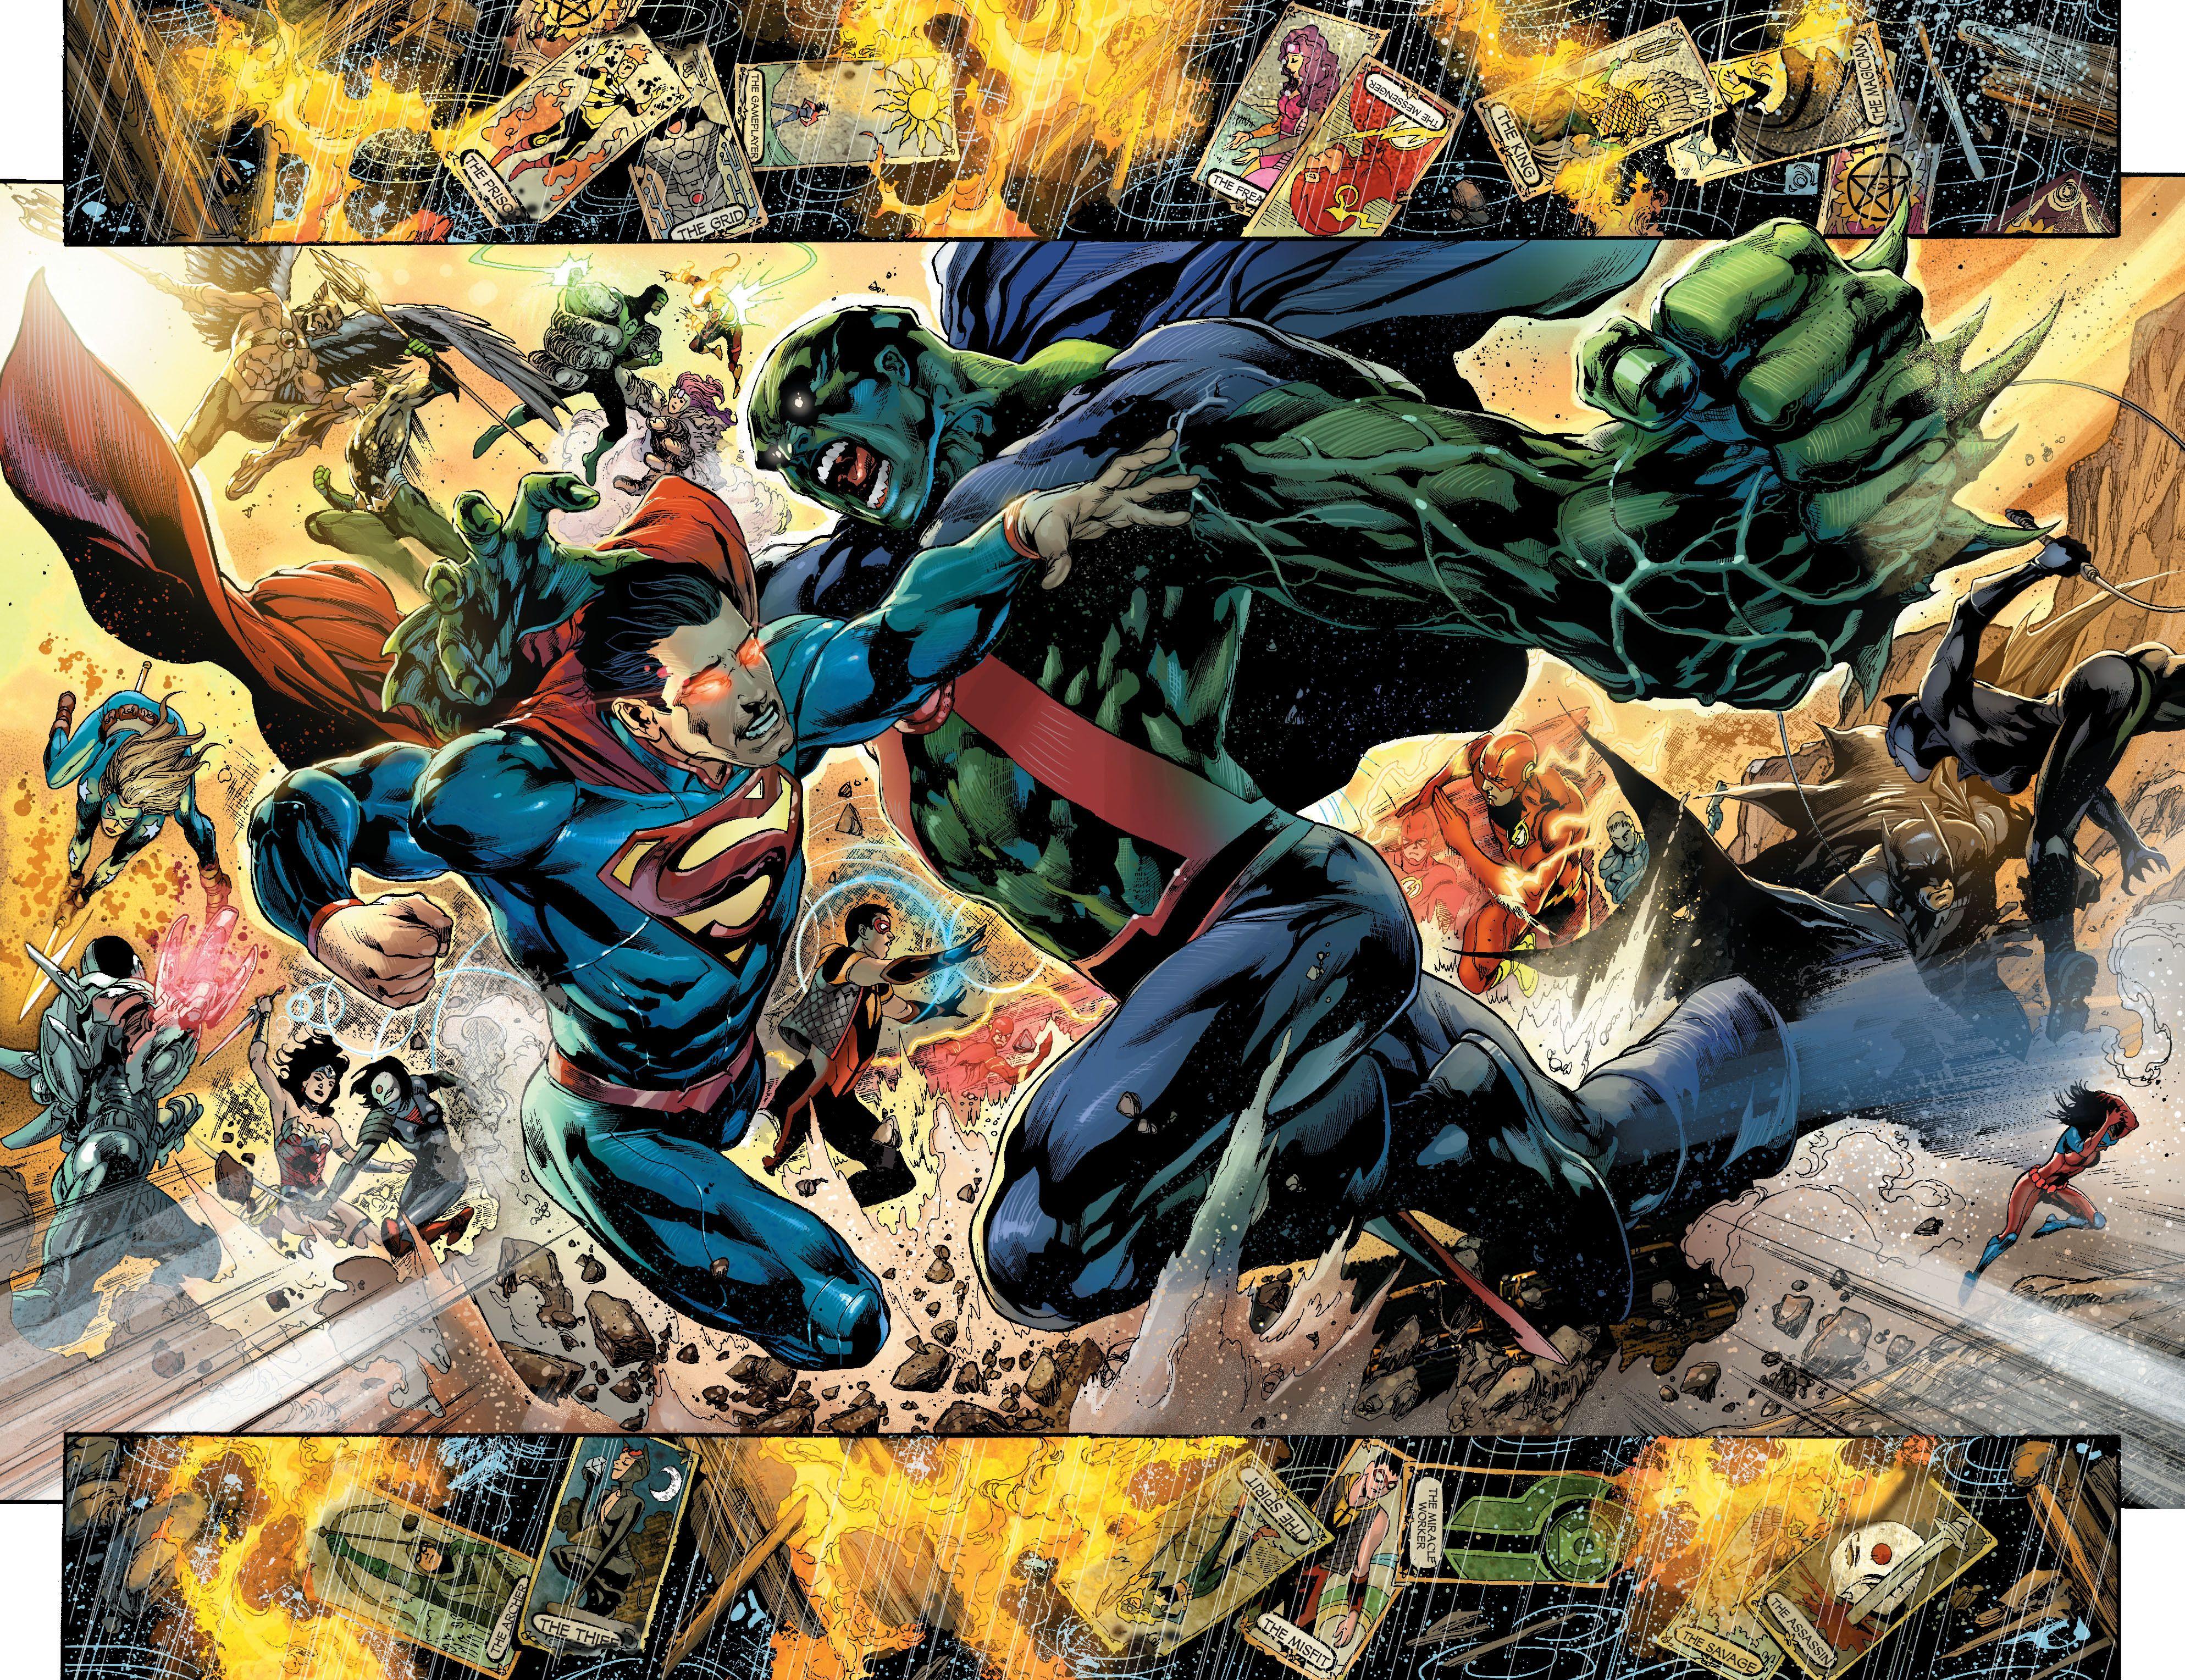 Superman Vs Martian Manhunter Martian Manhunter Justice League Villain Justice League